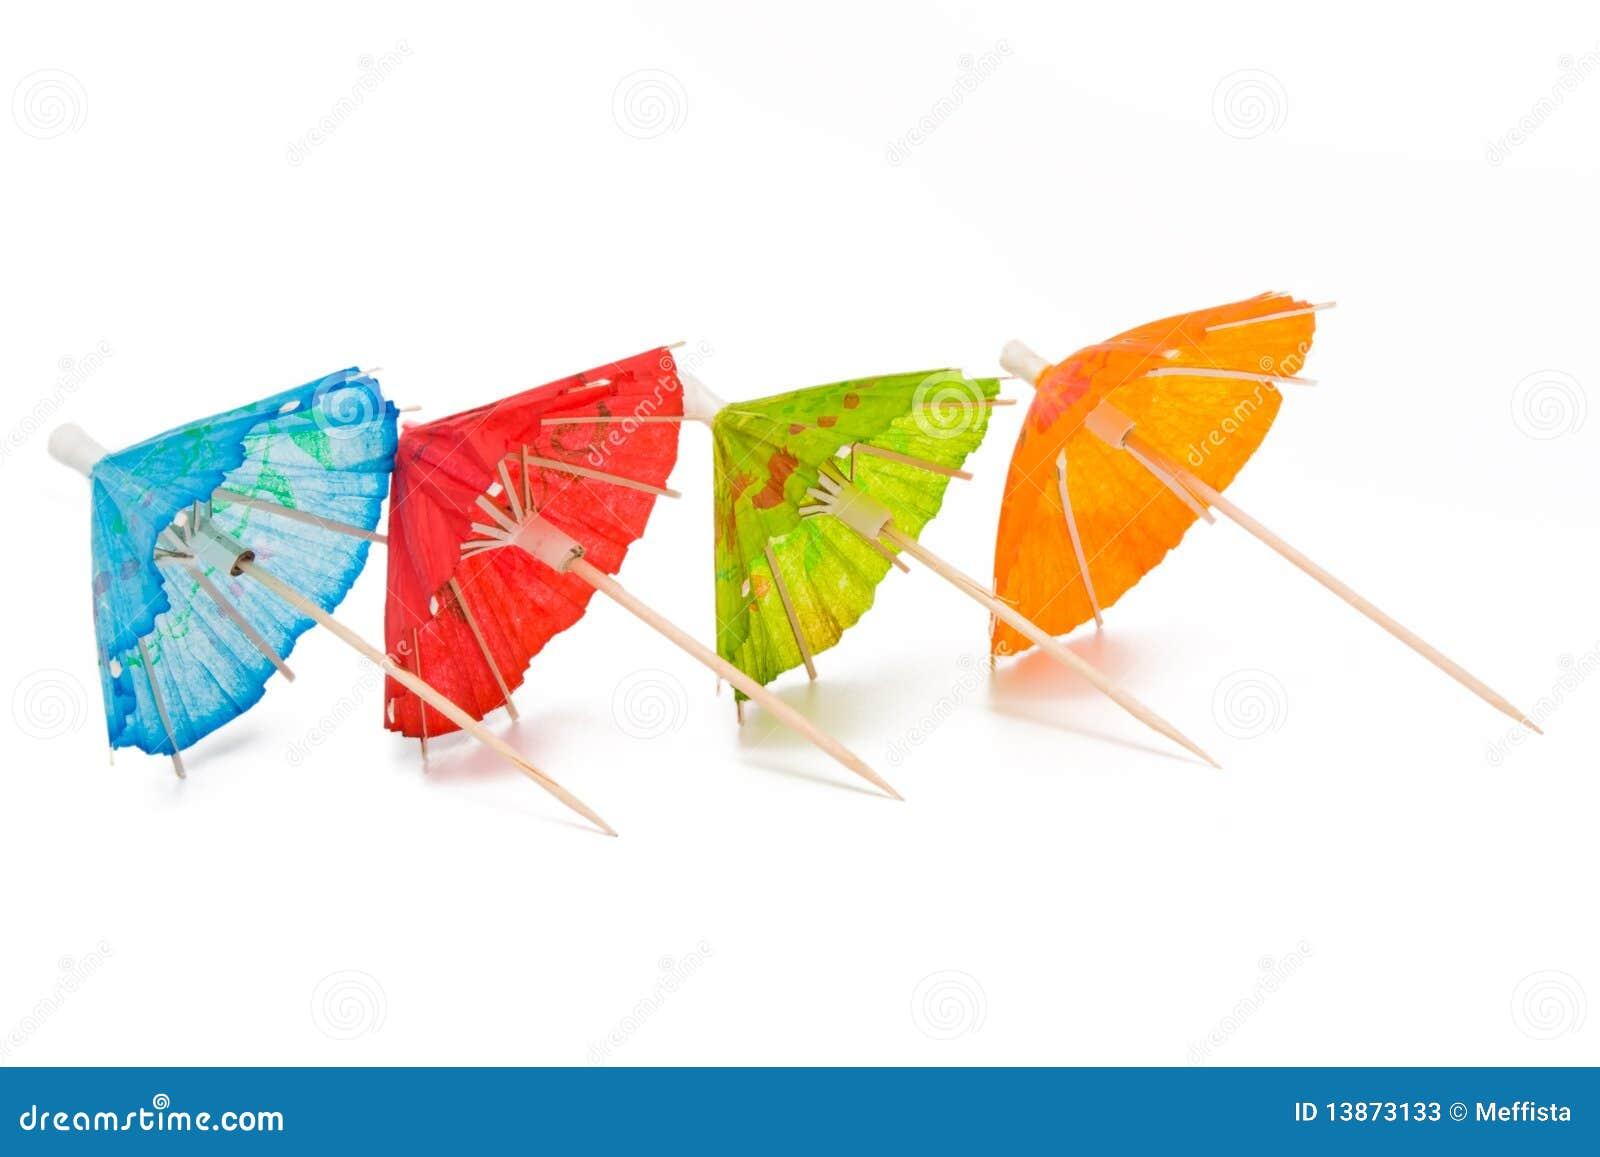 cocktail umbrellas stock photos image 13873133